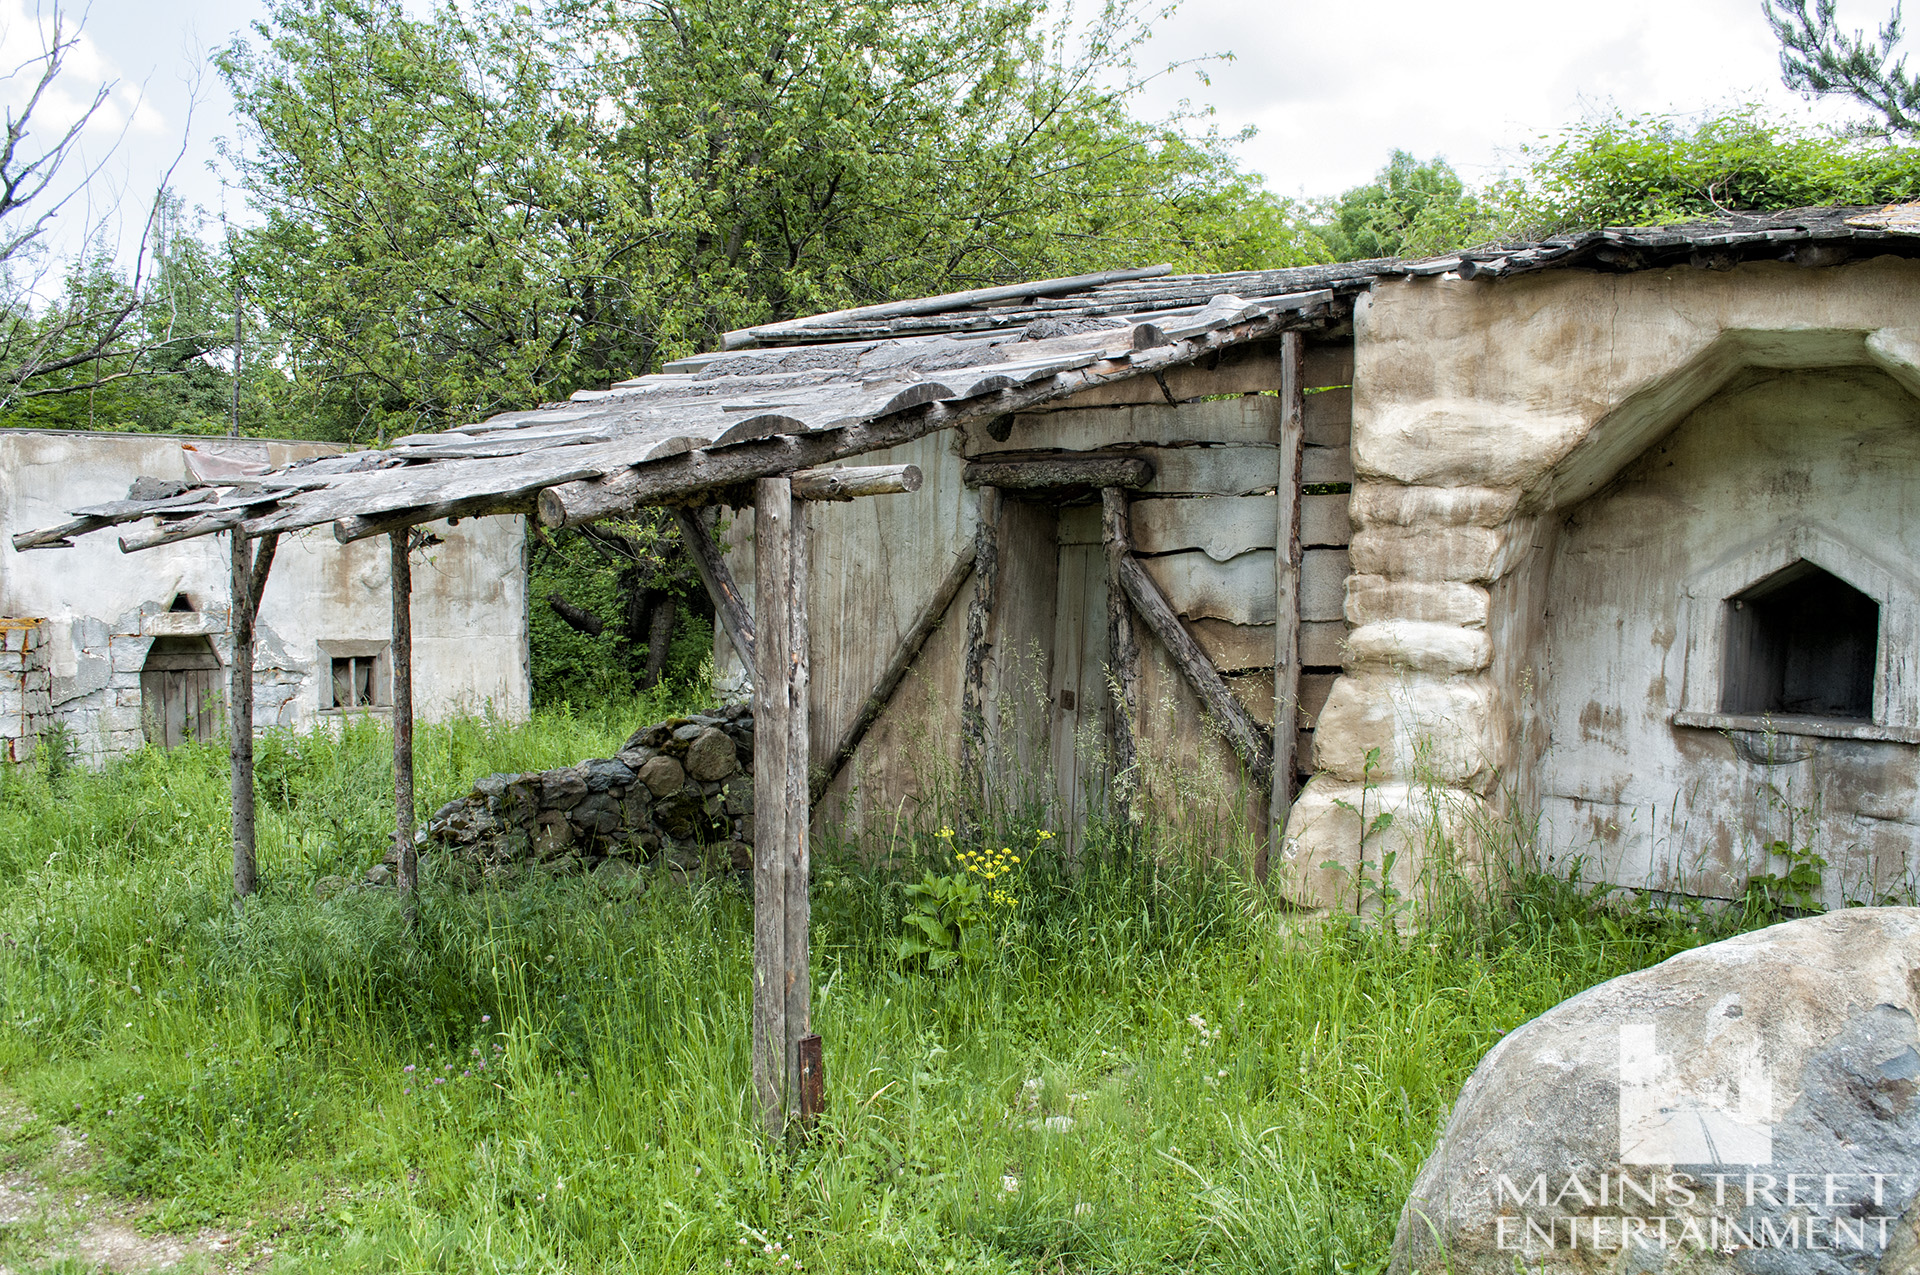 ancient village standing set